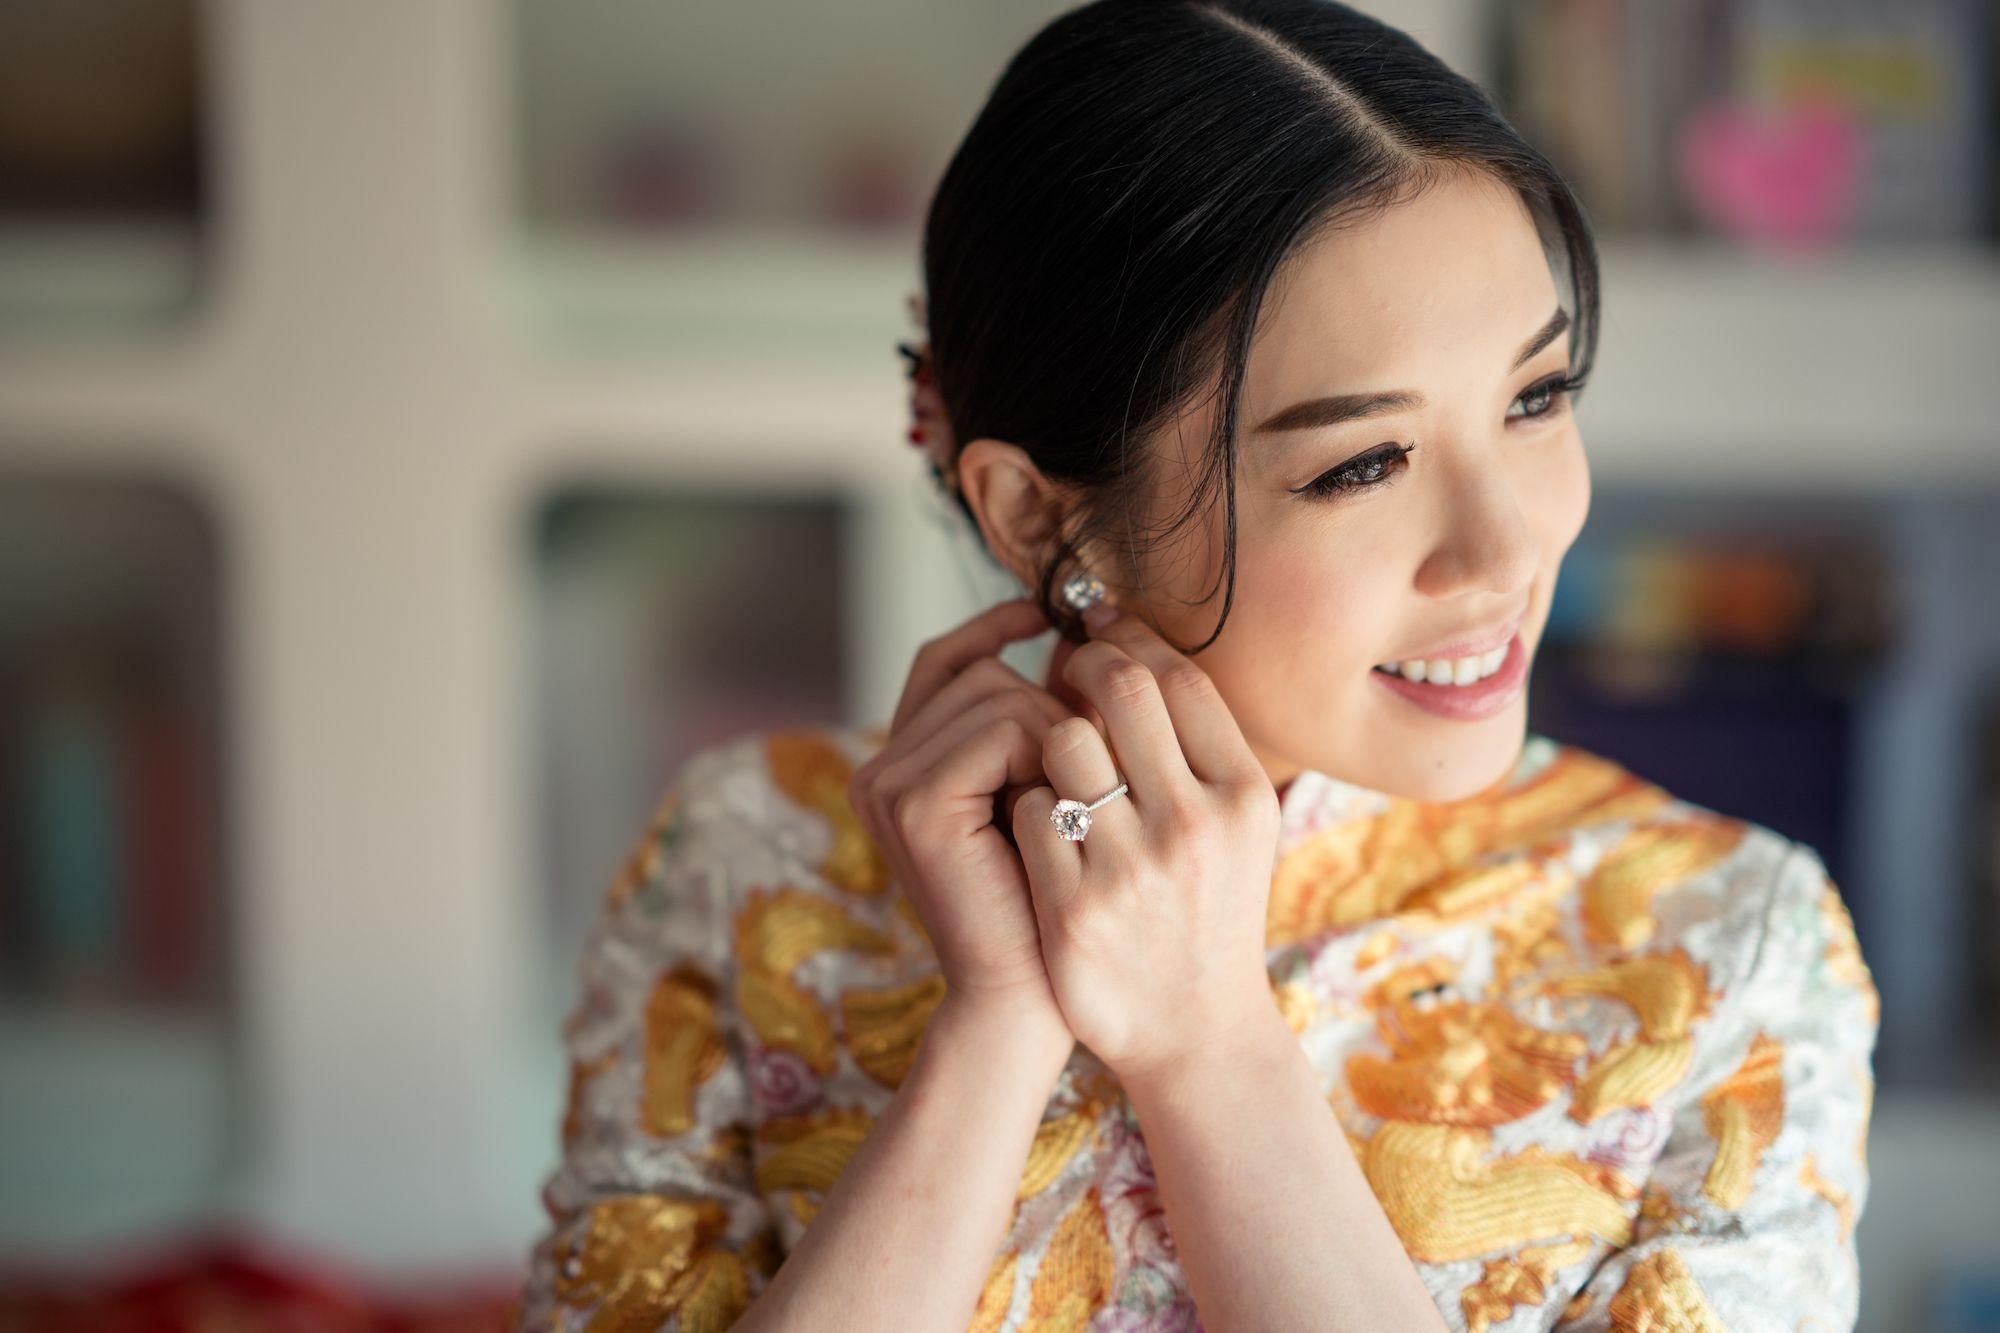 10 Minutes with Honey Pro Handheld UV Sanitiser Founder, Carmen Yim